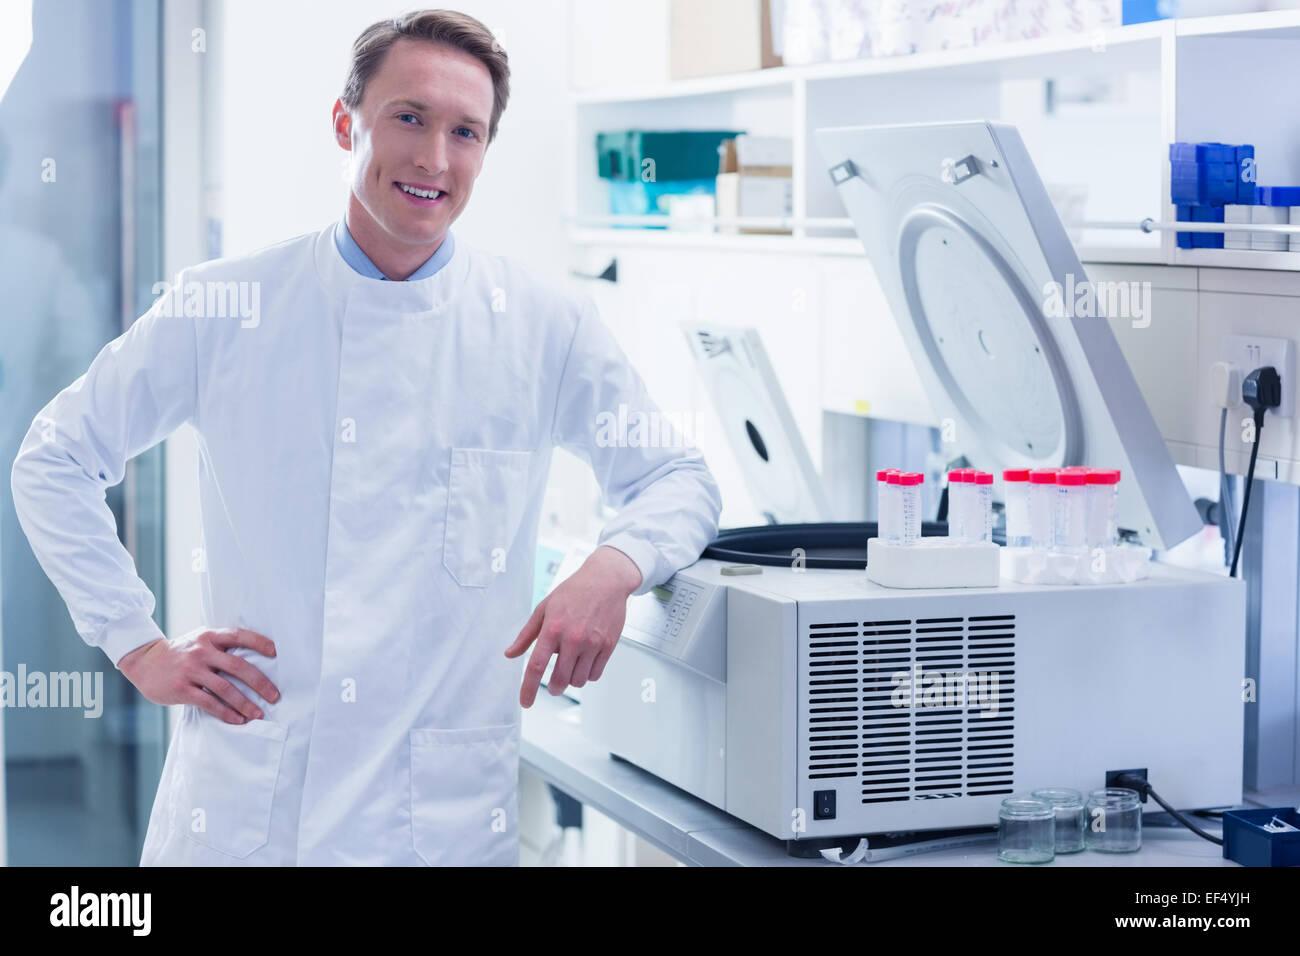 Smiling chemist leaning against the centrifuge - Stock Image